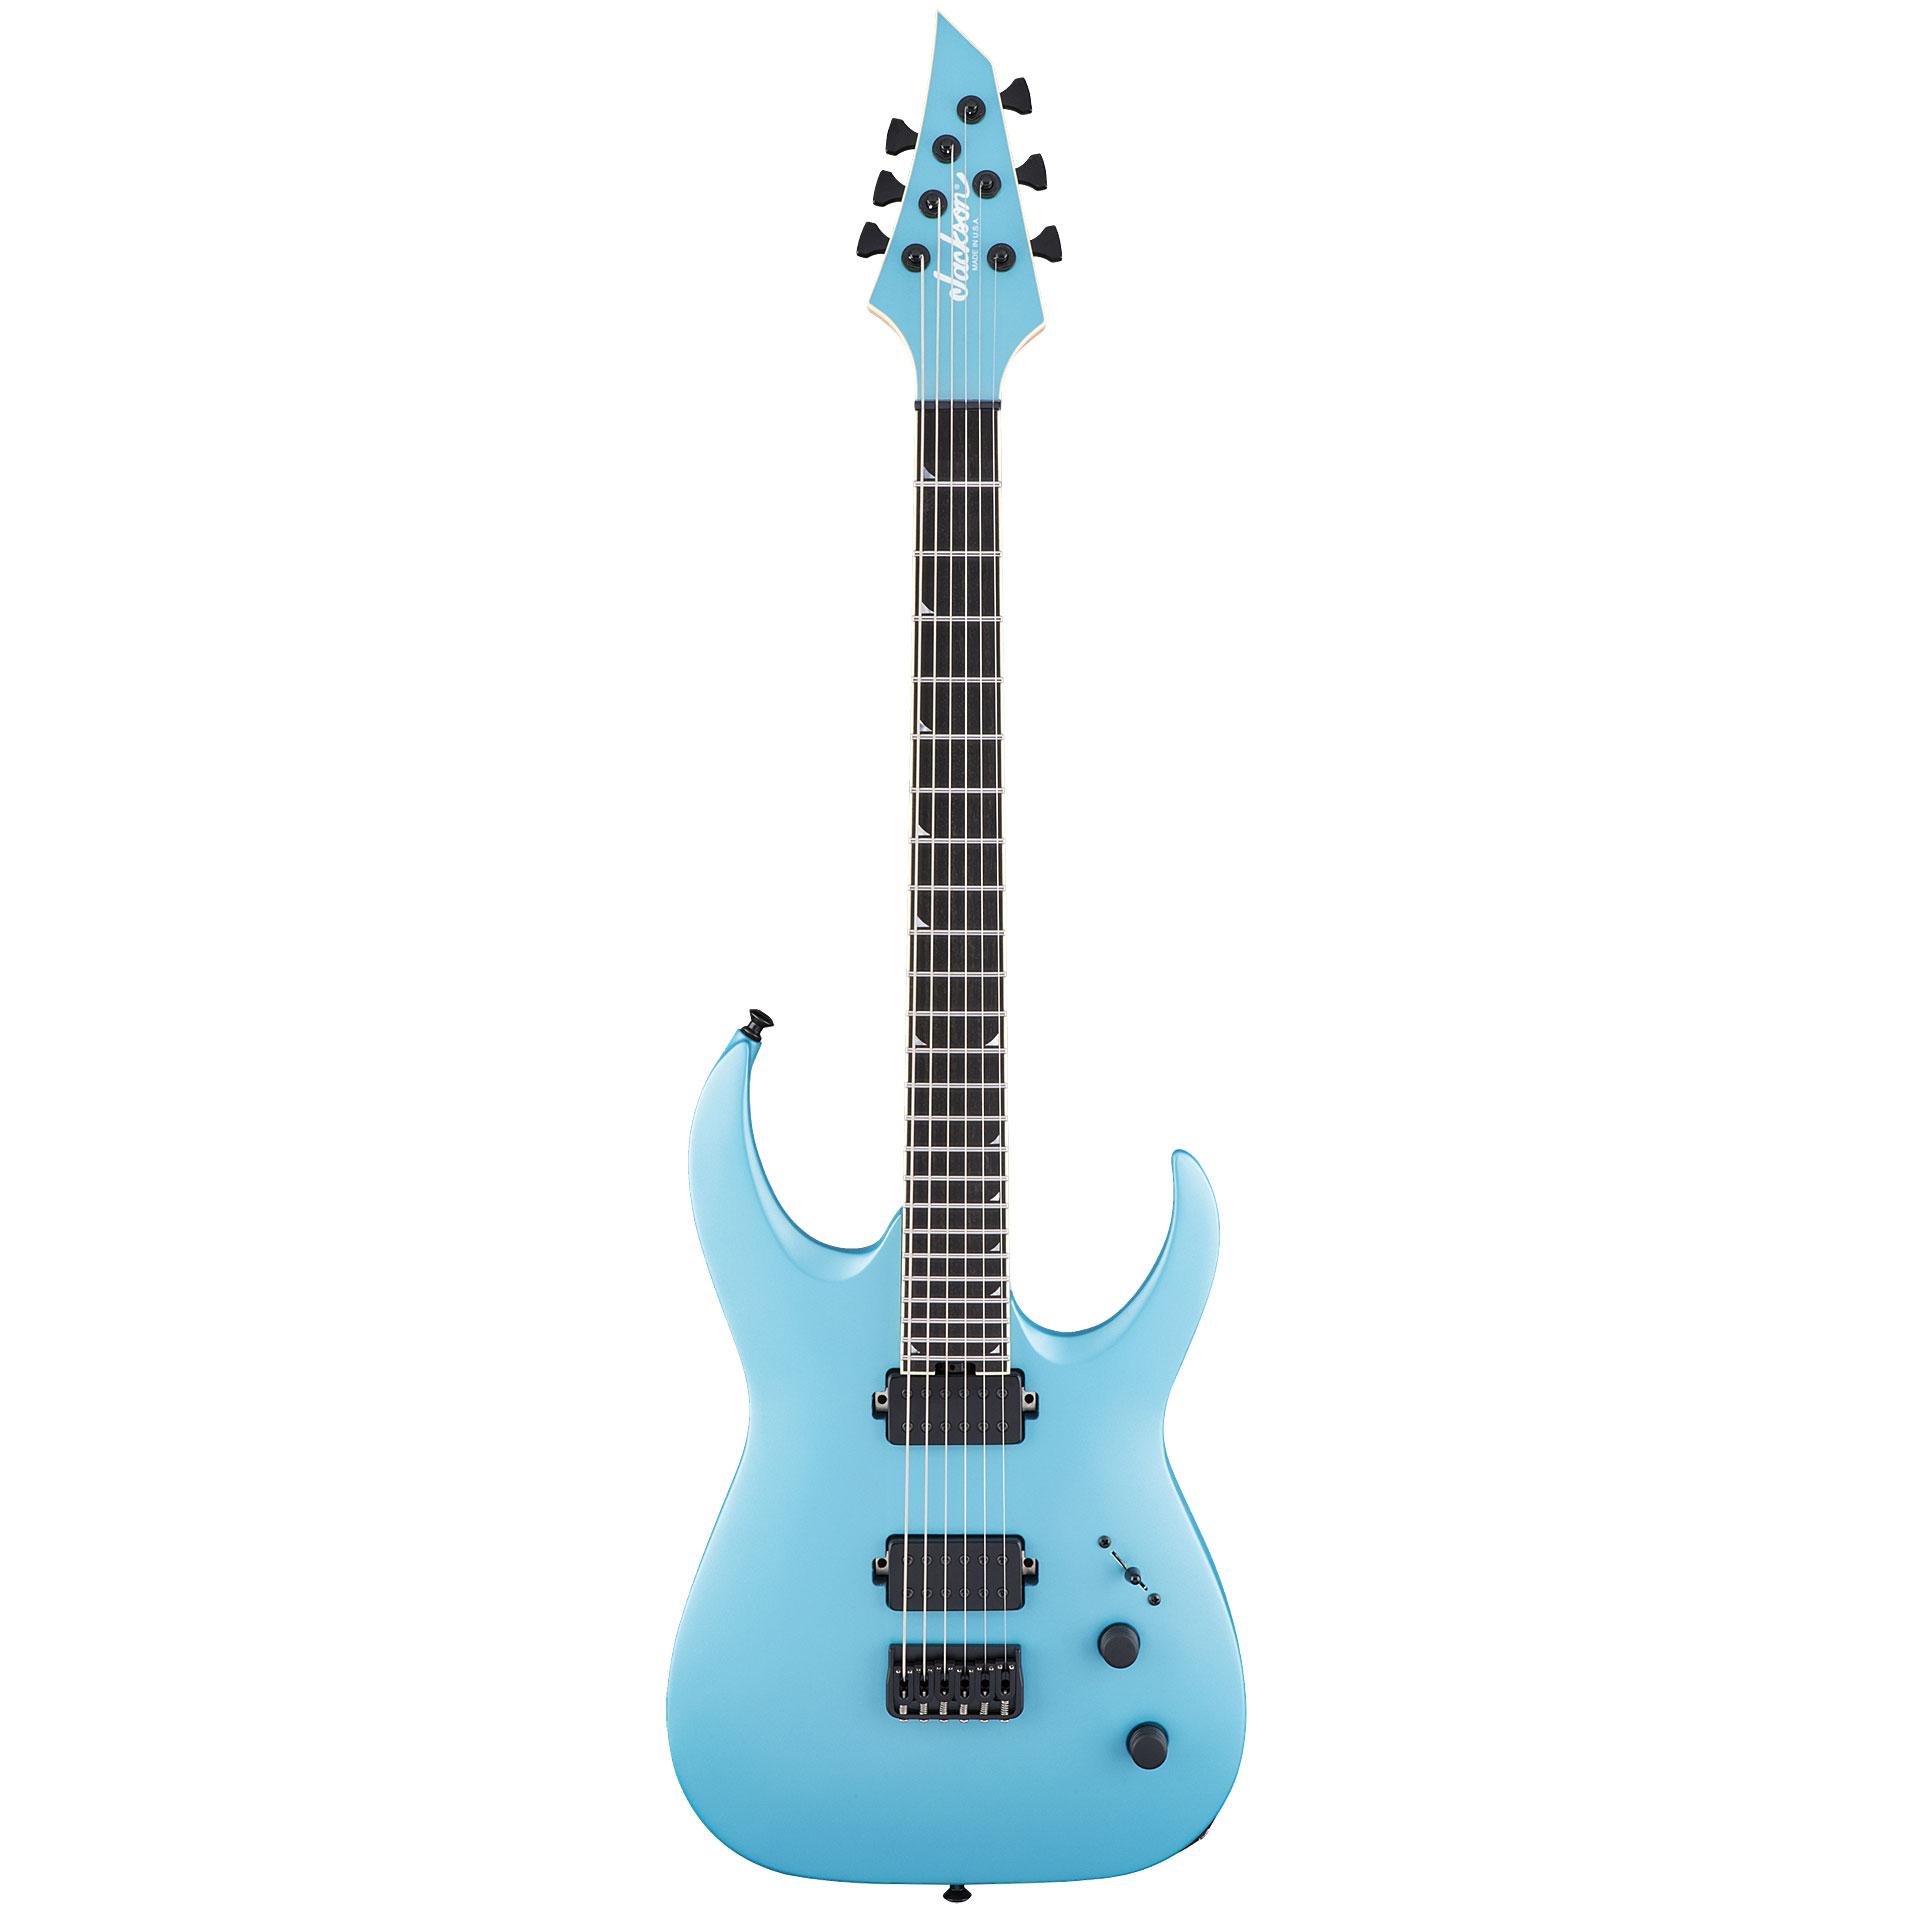 jackson usa signature misha mansoor juggernaut ht6 mbf electric guitar. Black Bedroom Furniture Sets. Home Design Ideas